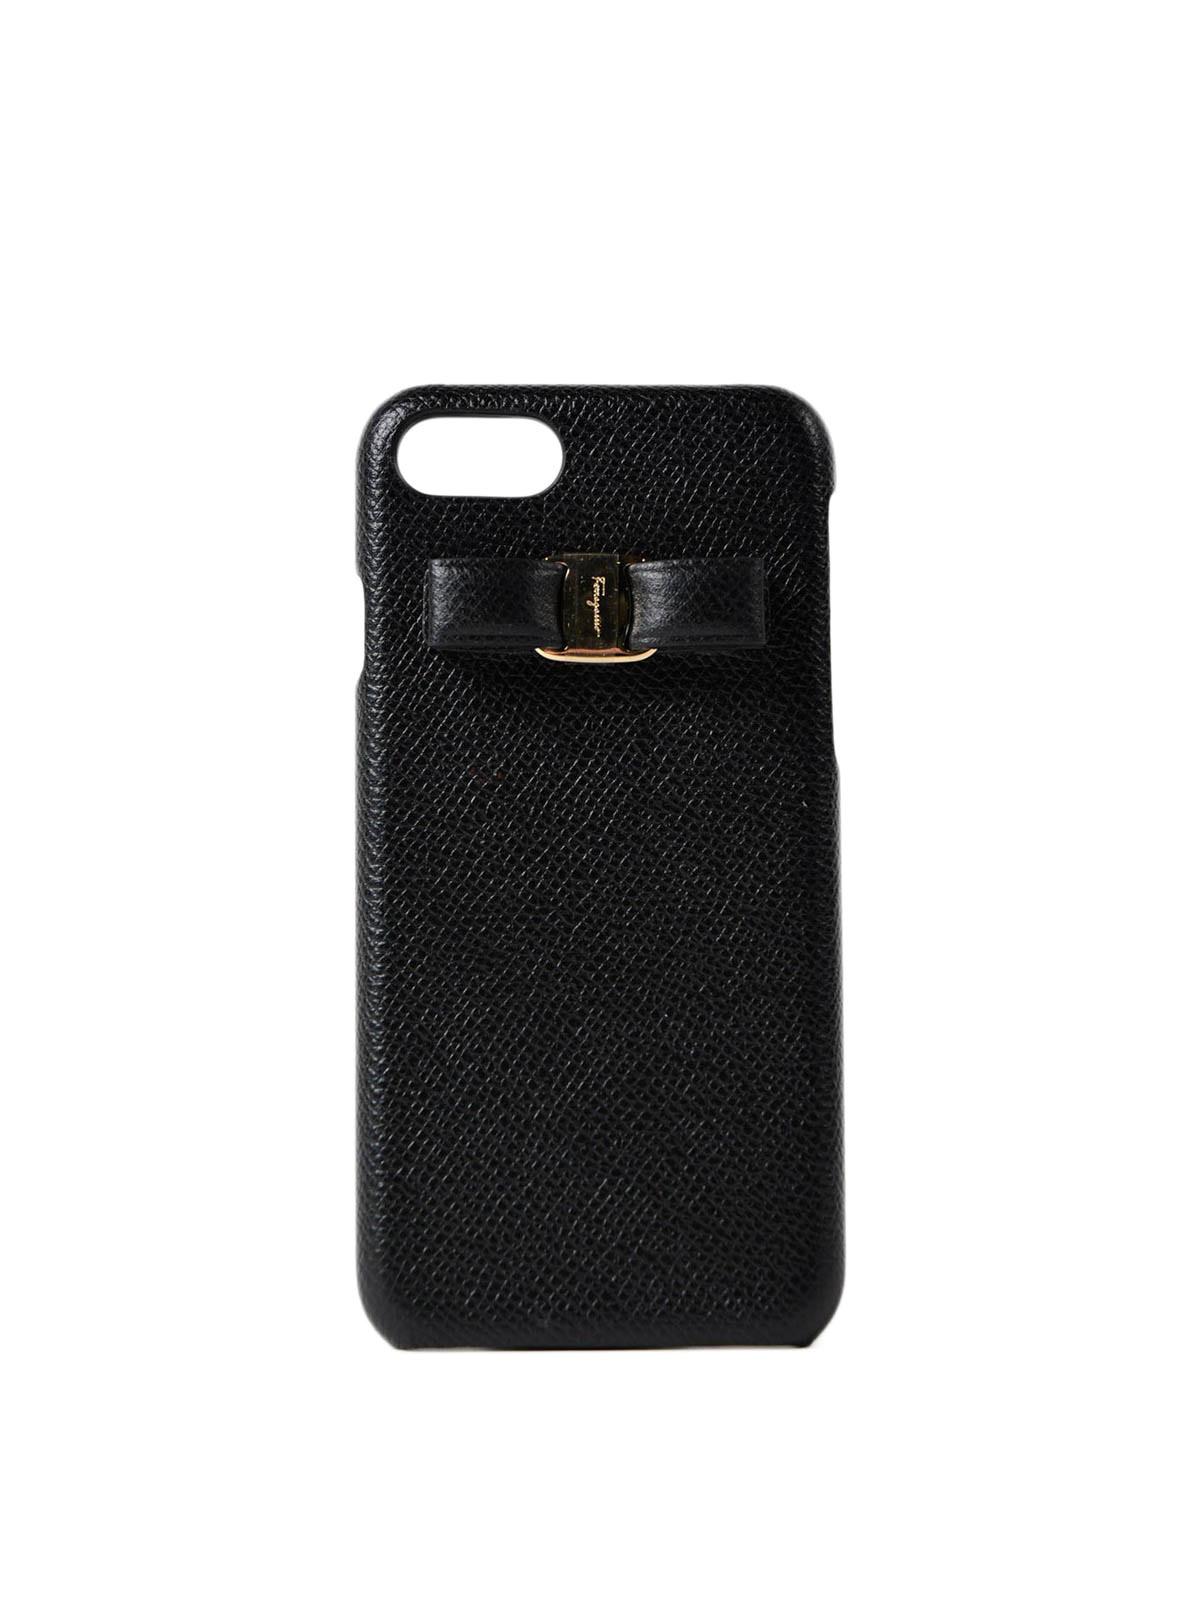 online store 000a1 7a6e2 Salvatore Ferragamo - iPhone 7 Vara bow case - Cases & Covers ...